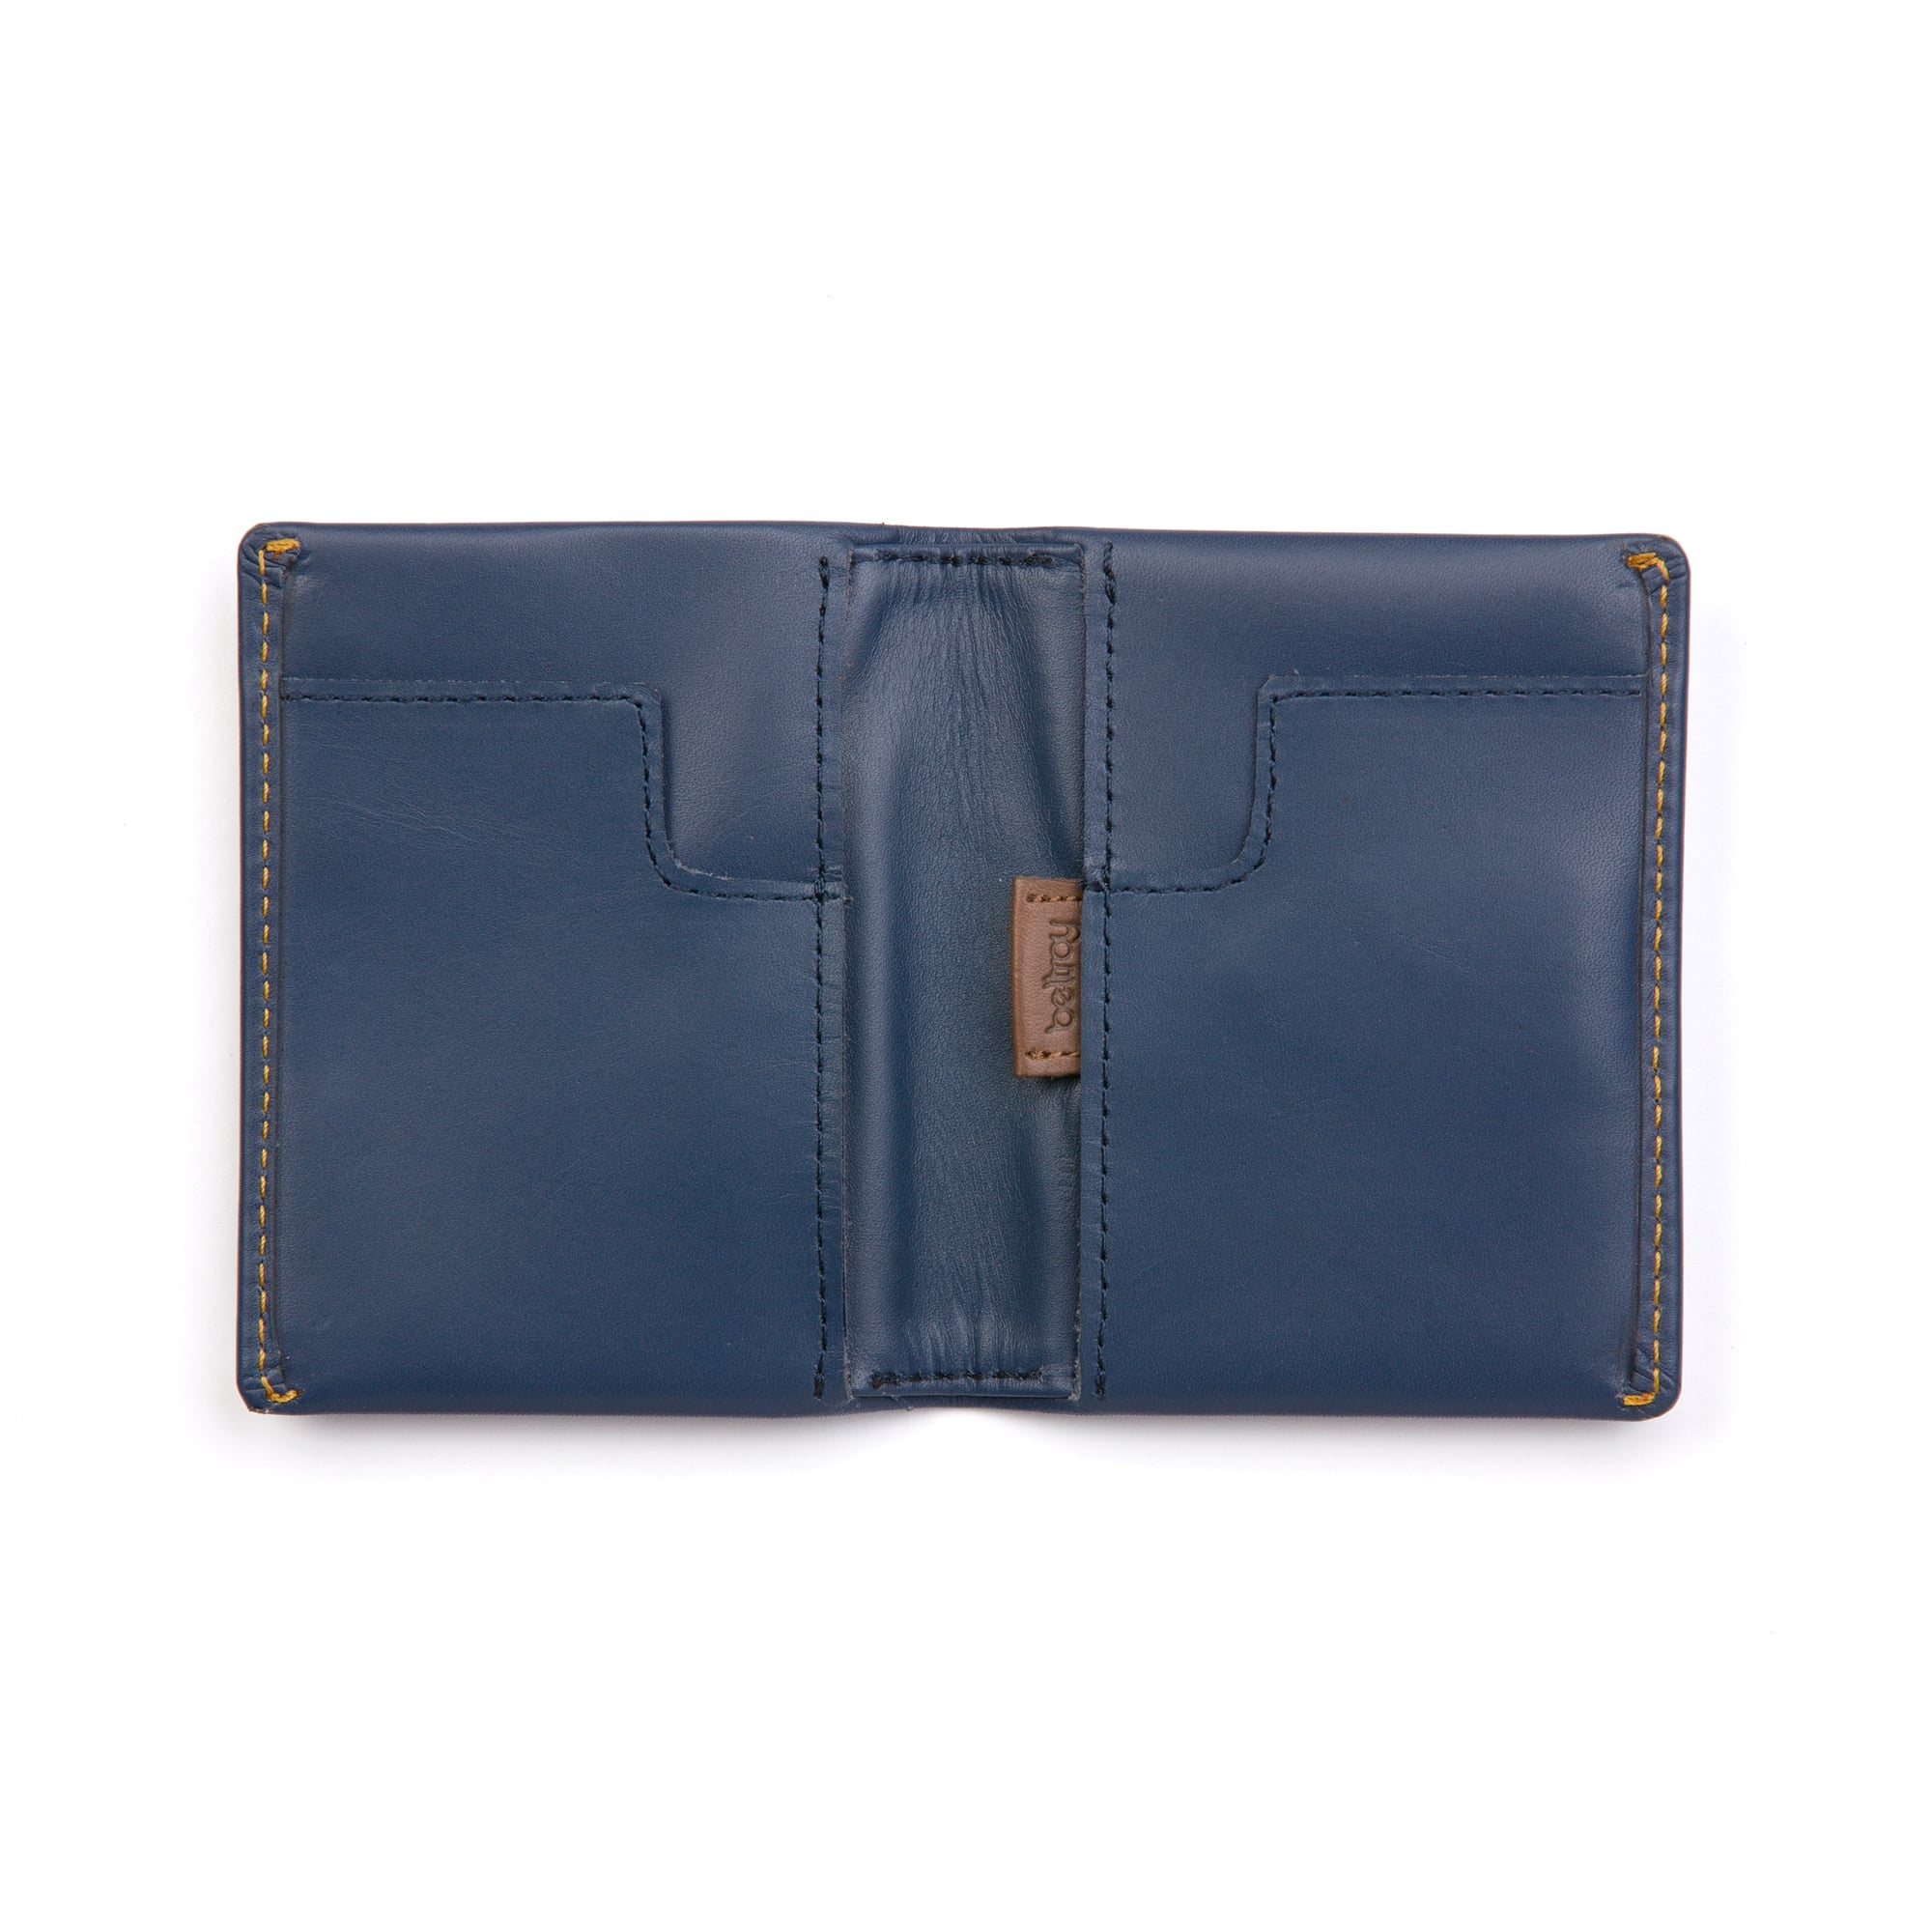 991a9017d1 Bellroy Bellroy Slim Sleeve Wallet Blue Steel 0708-WSSB